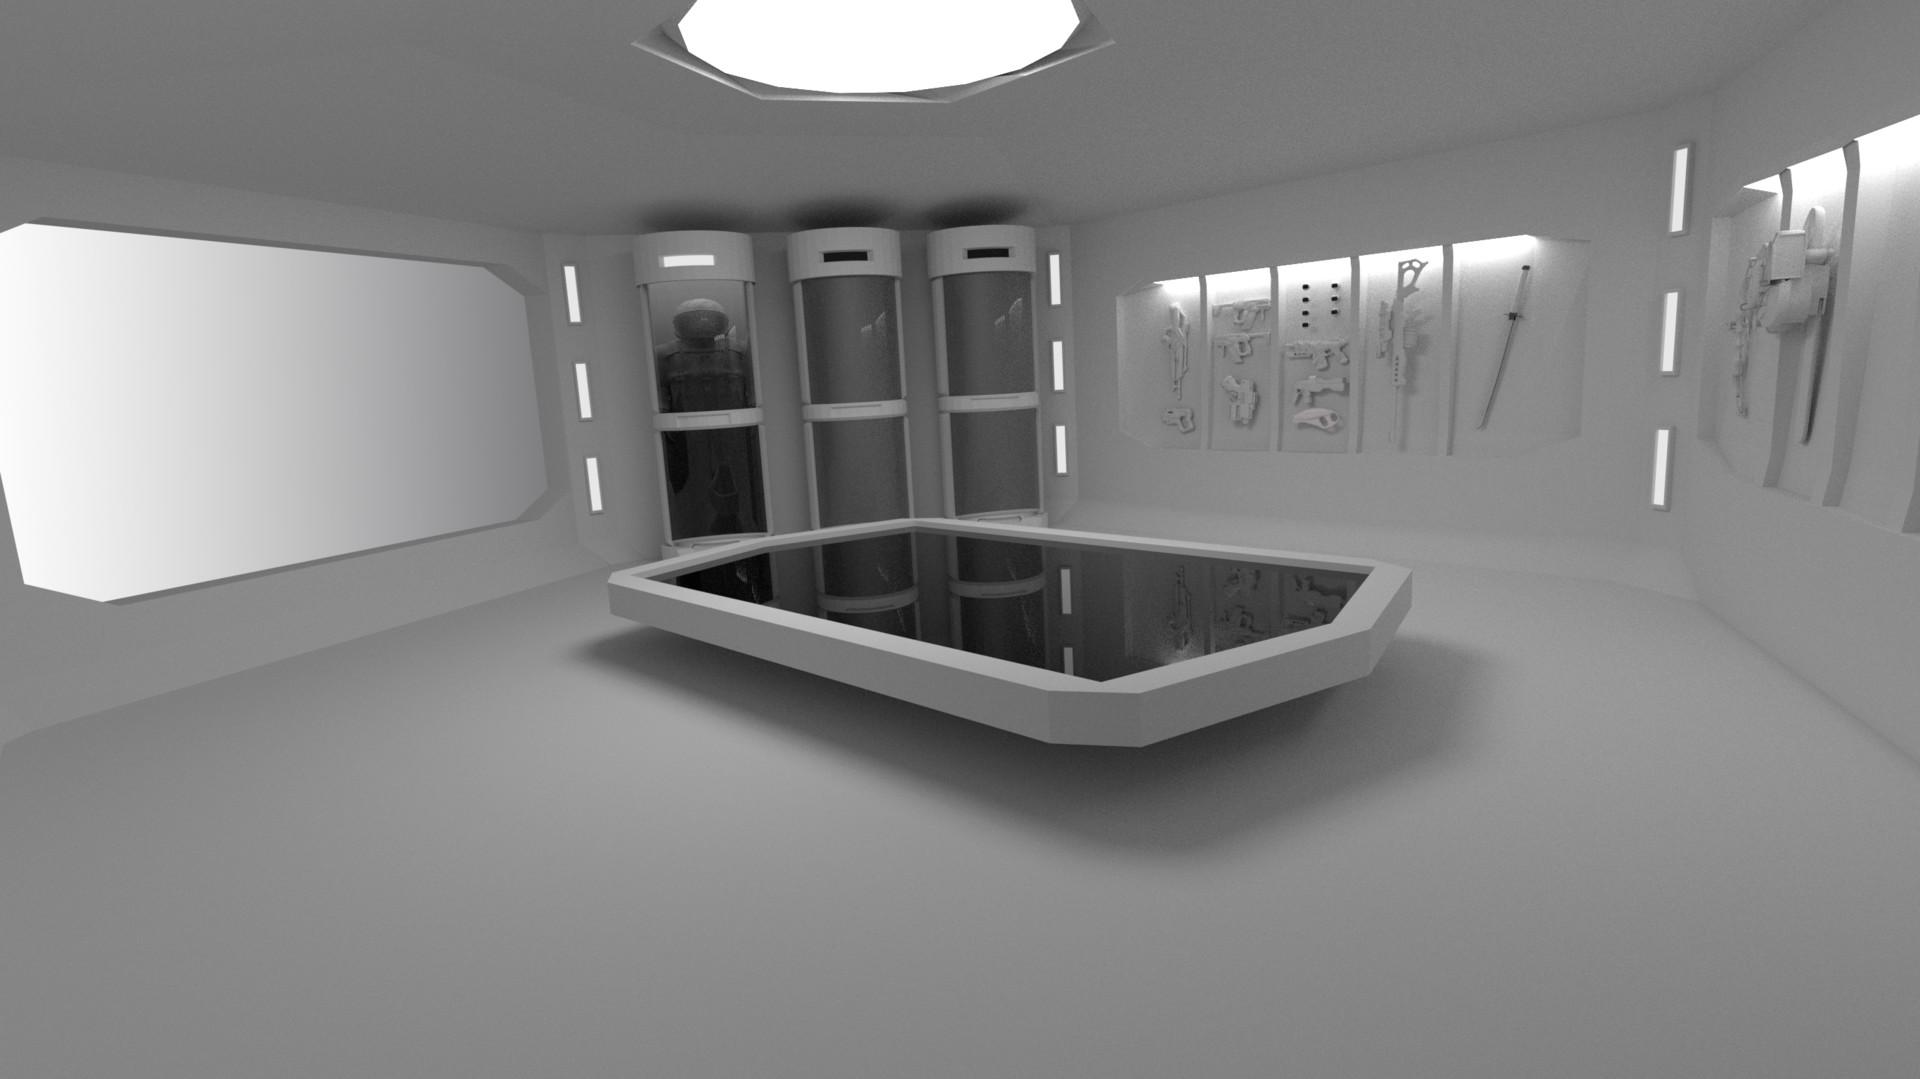 Art ankhn level armory render